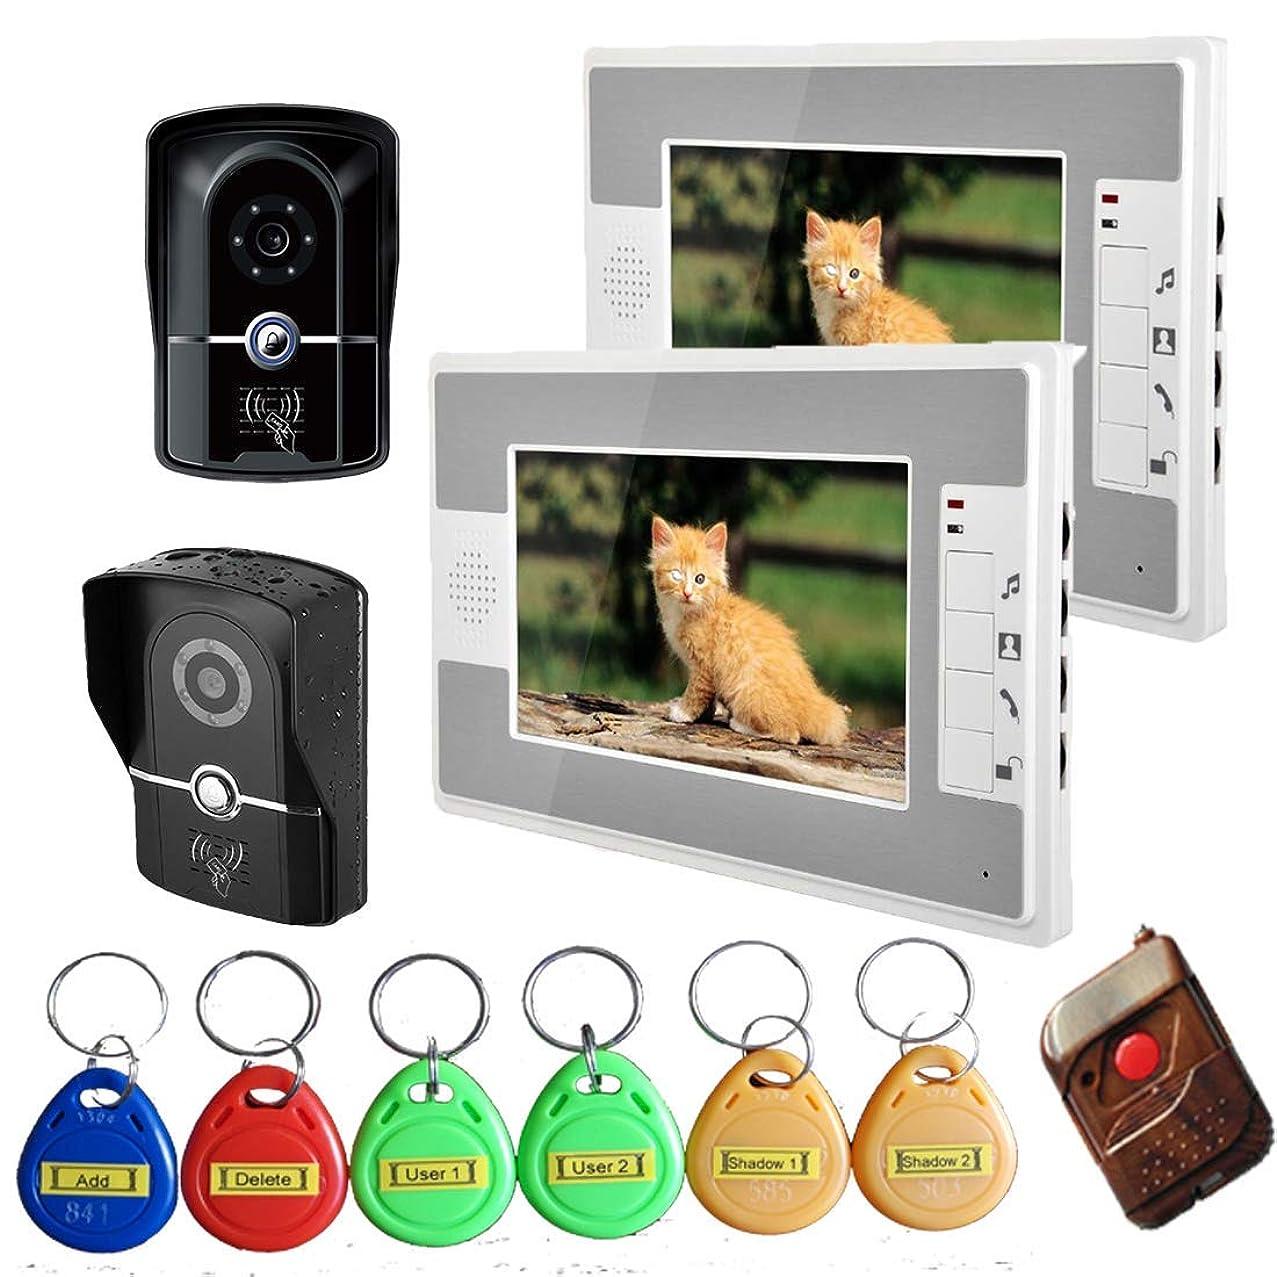 TQ 7 inch Intelligent Video doorbell Remote intercom Access Control System HD 1000TVL Infrared Camera,B